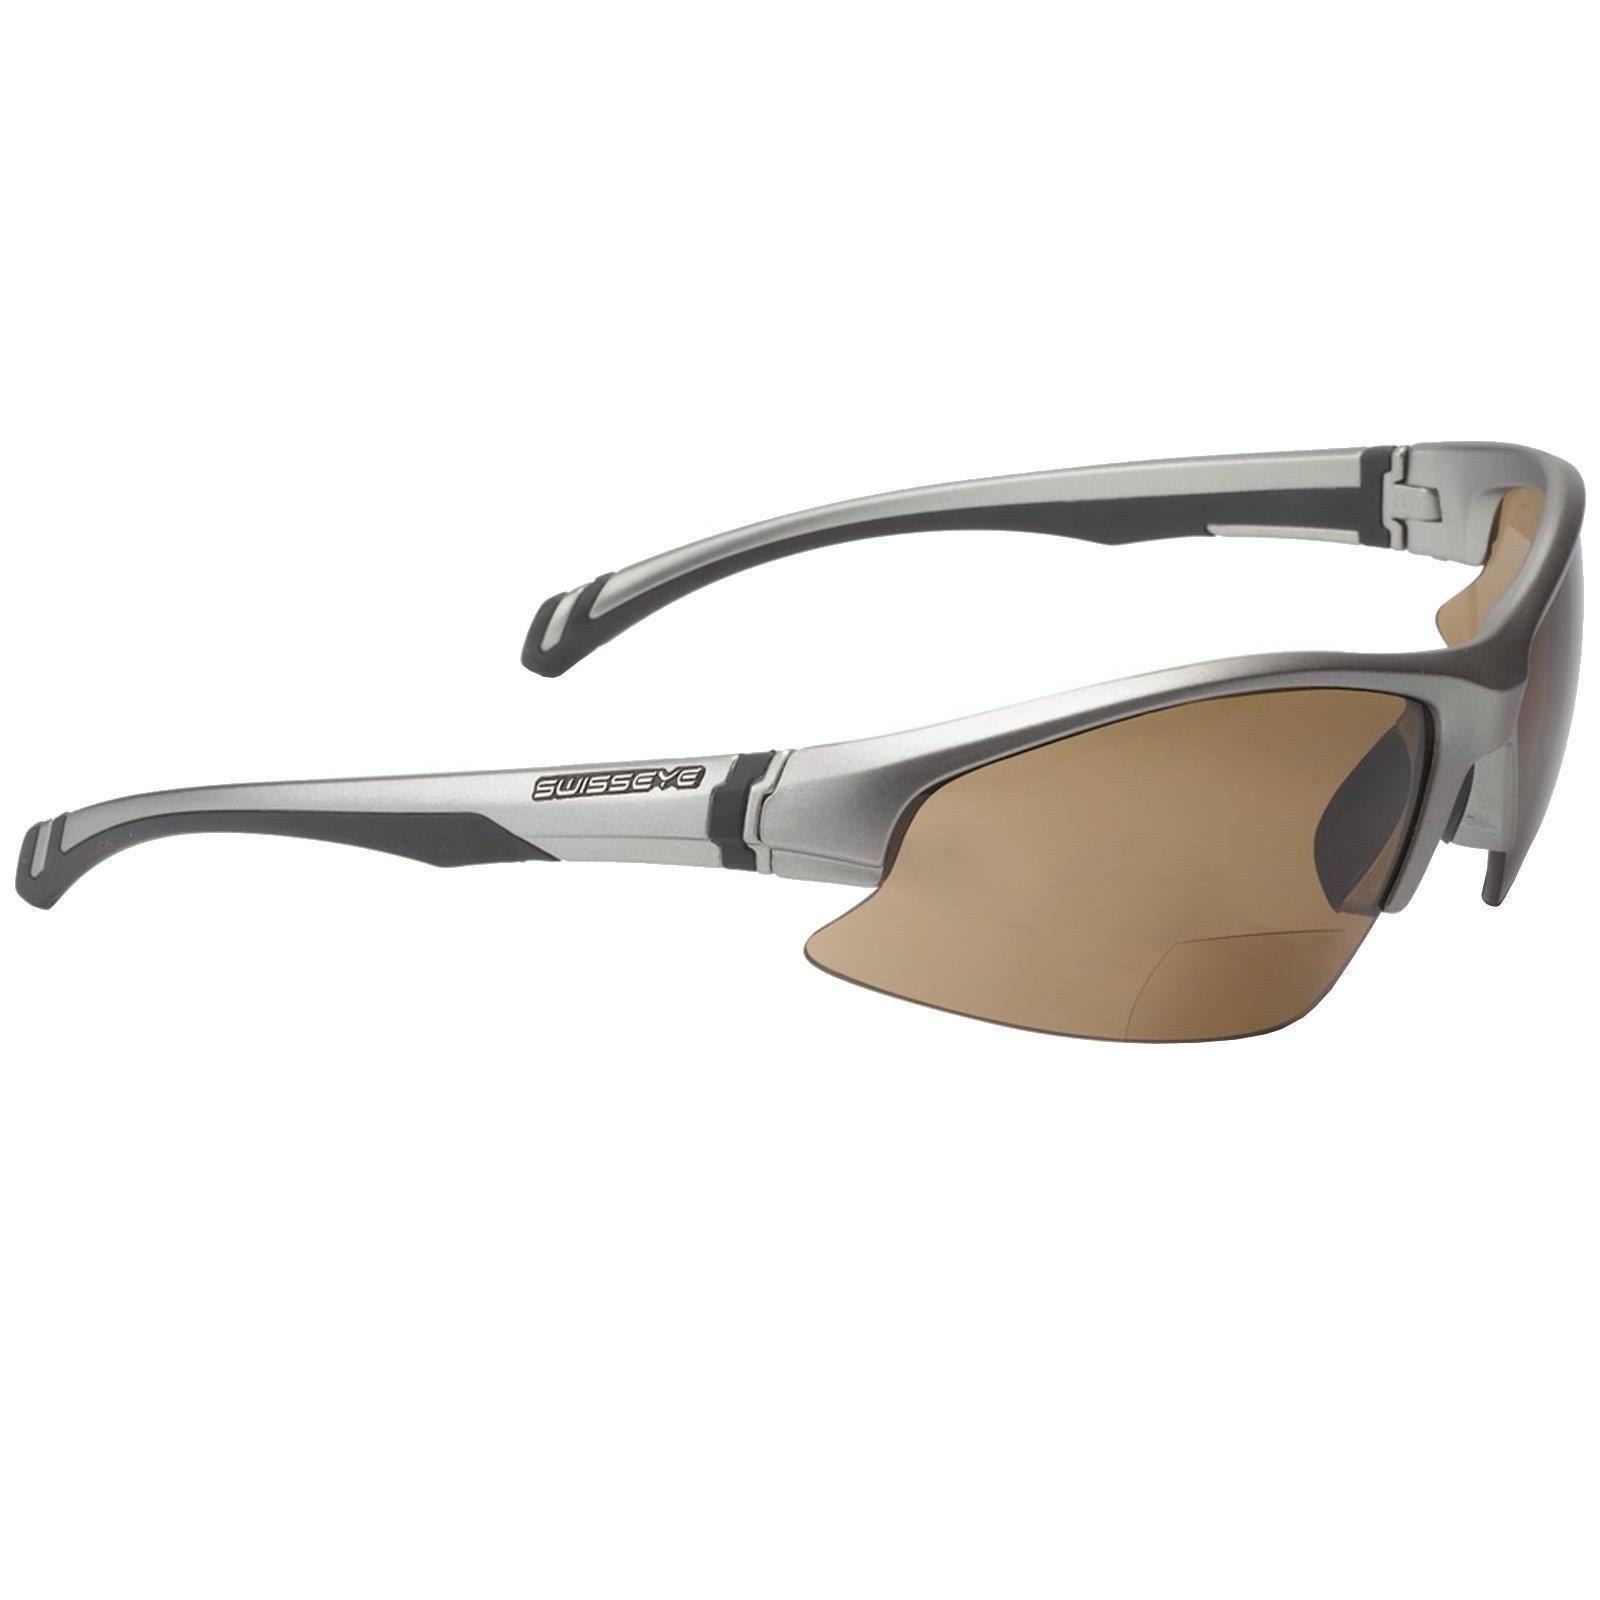 Swisseye Fahrrad Sport Brille Flash Bifocal 2,5 Dioptrie Sehstärke MTB Trail FR